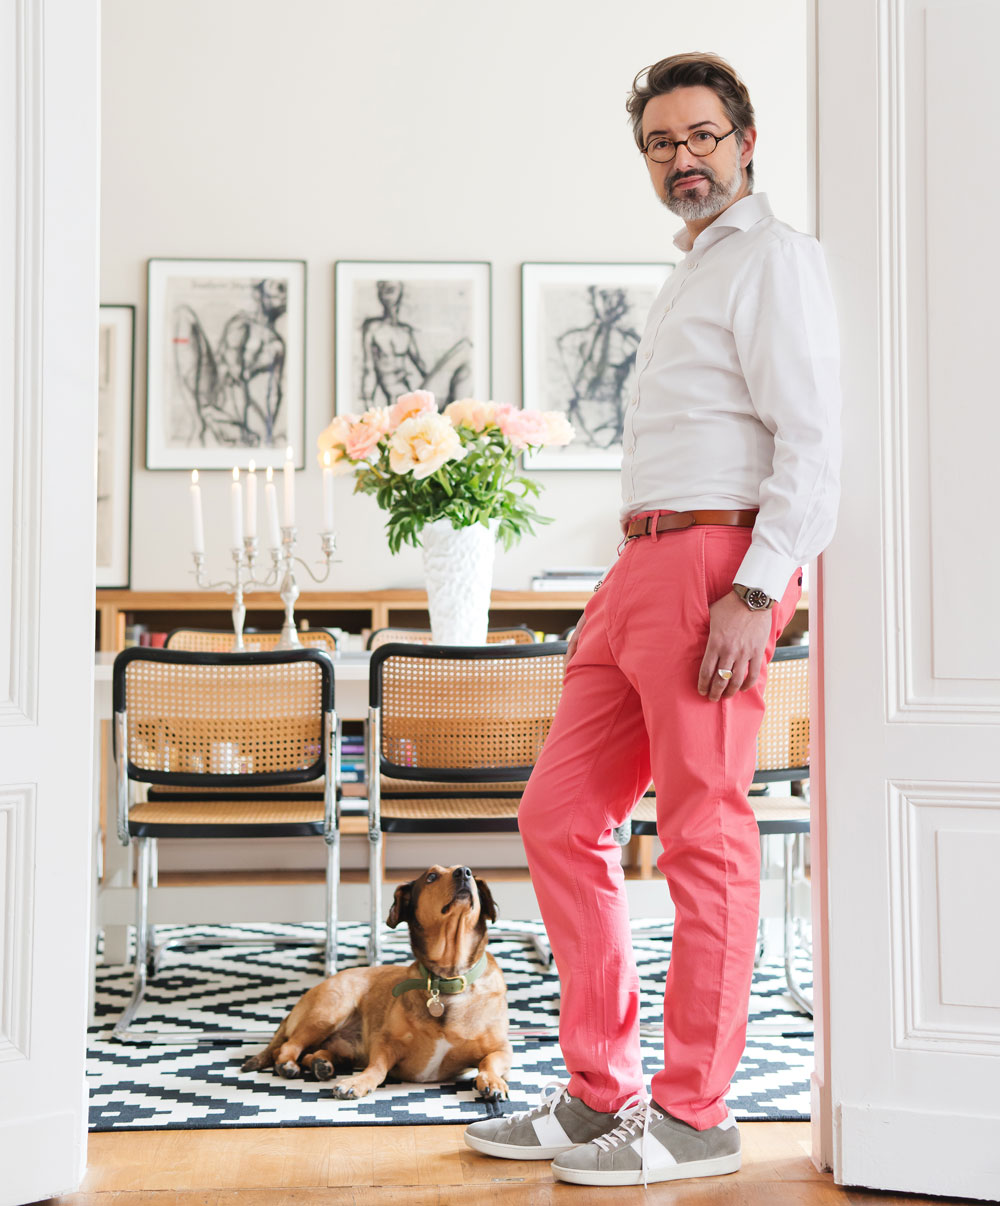 Thorsten Osterberger